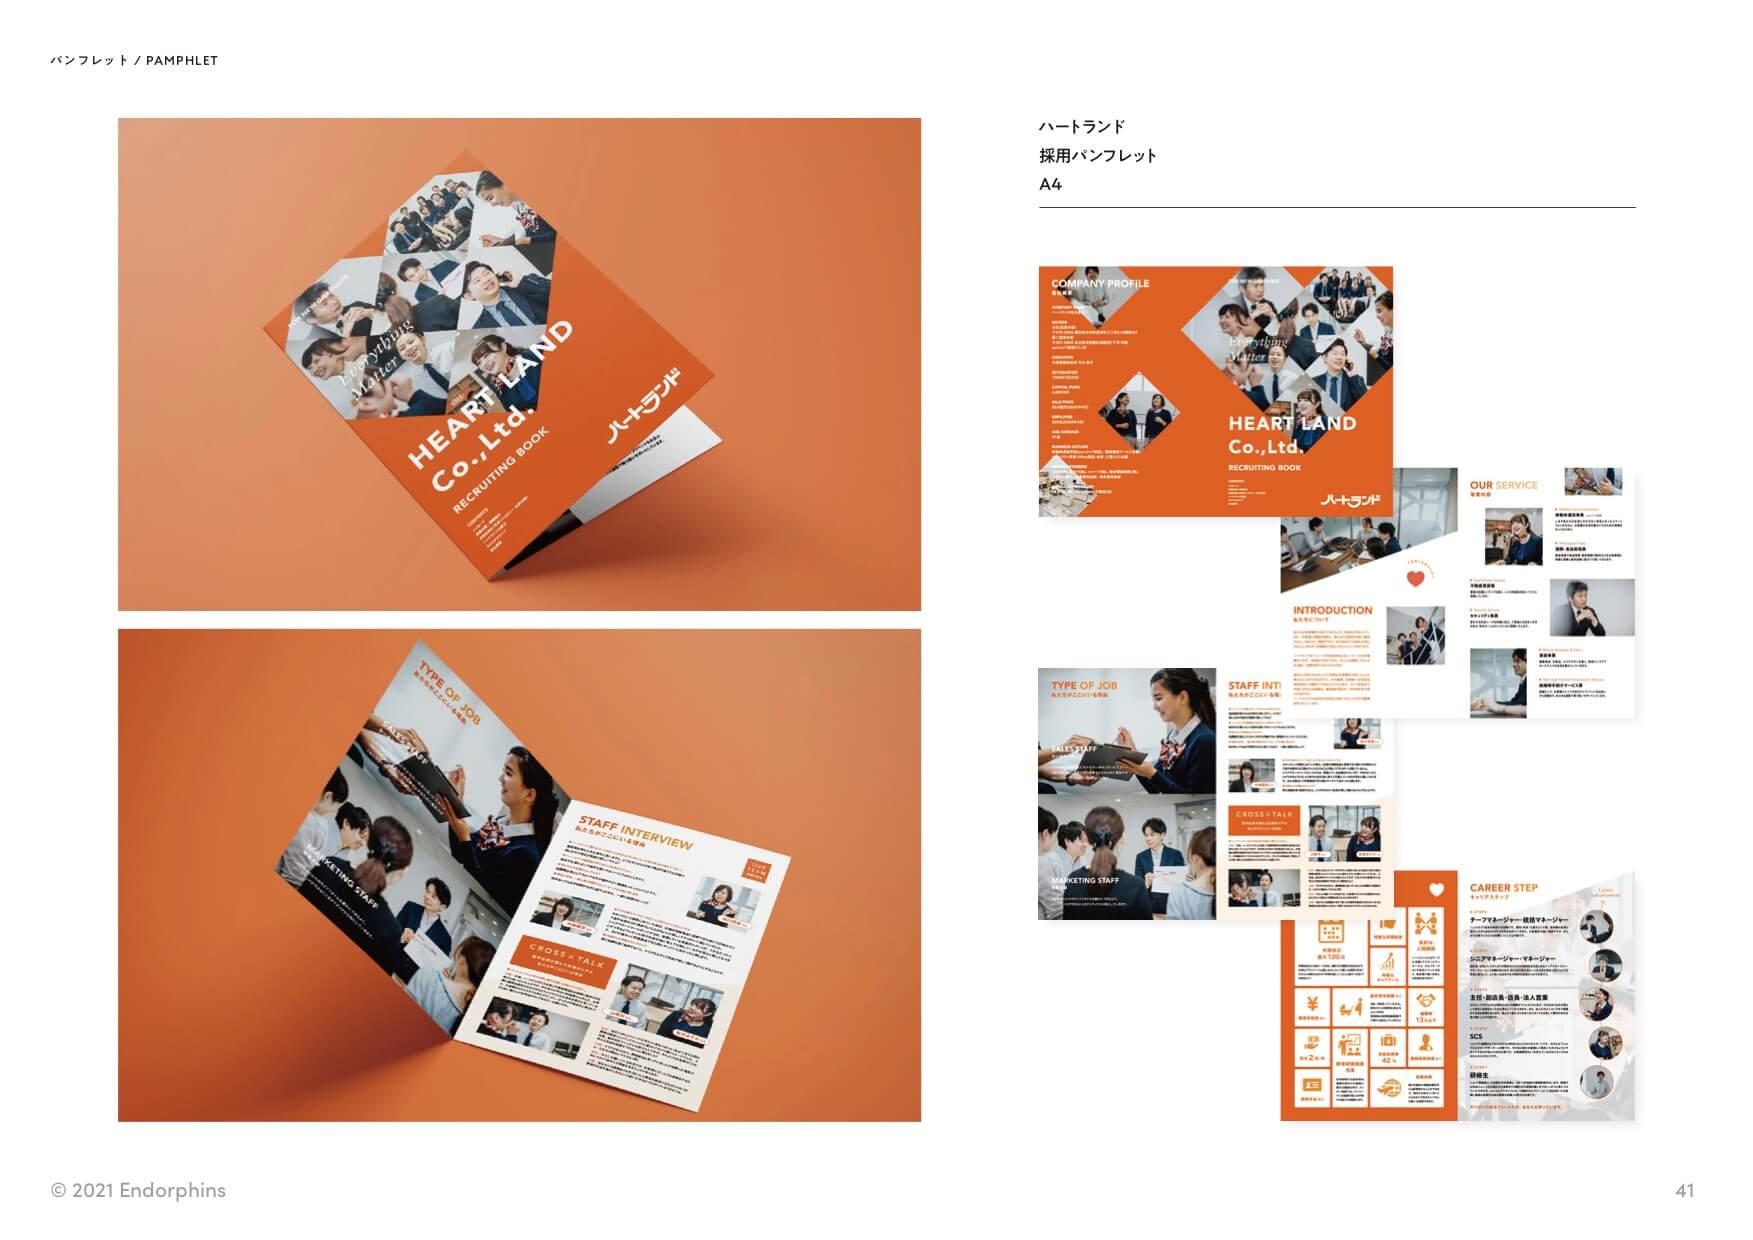 webサイト制作&デザイン制作実績一覧6